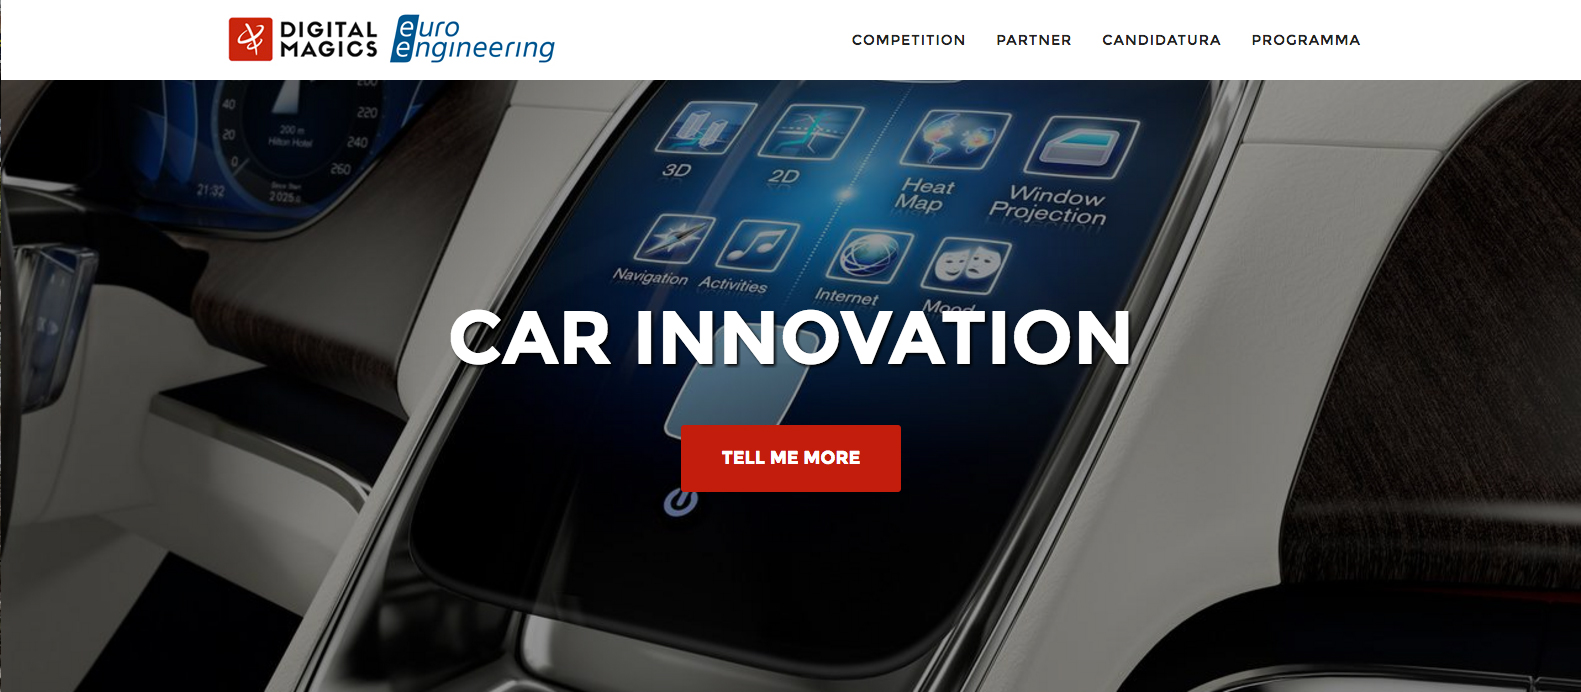 car innovation la call for ideas per startup dell 39 automotive. Black Bedroom Furniture Sets. Home Design Ideas